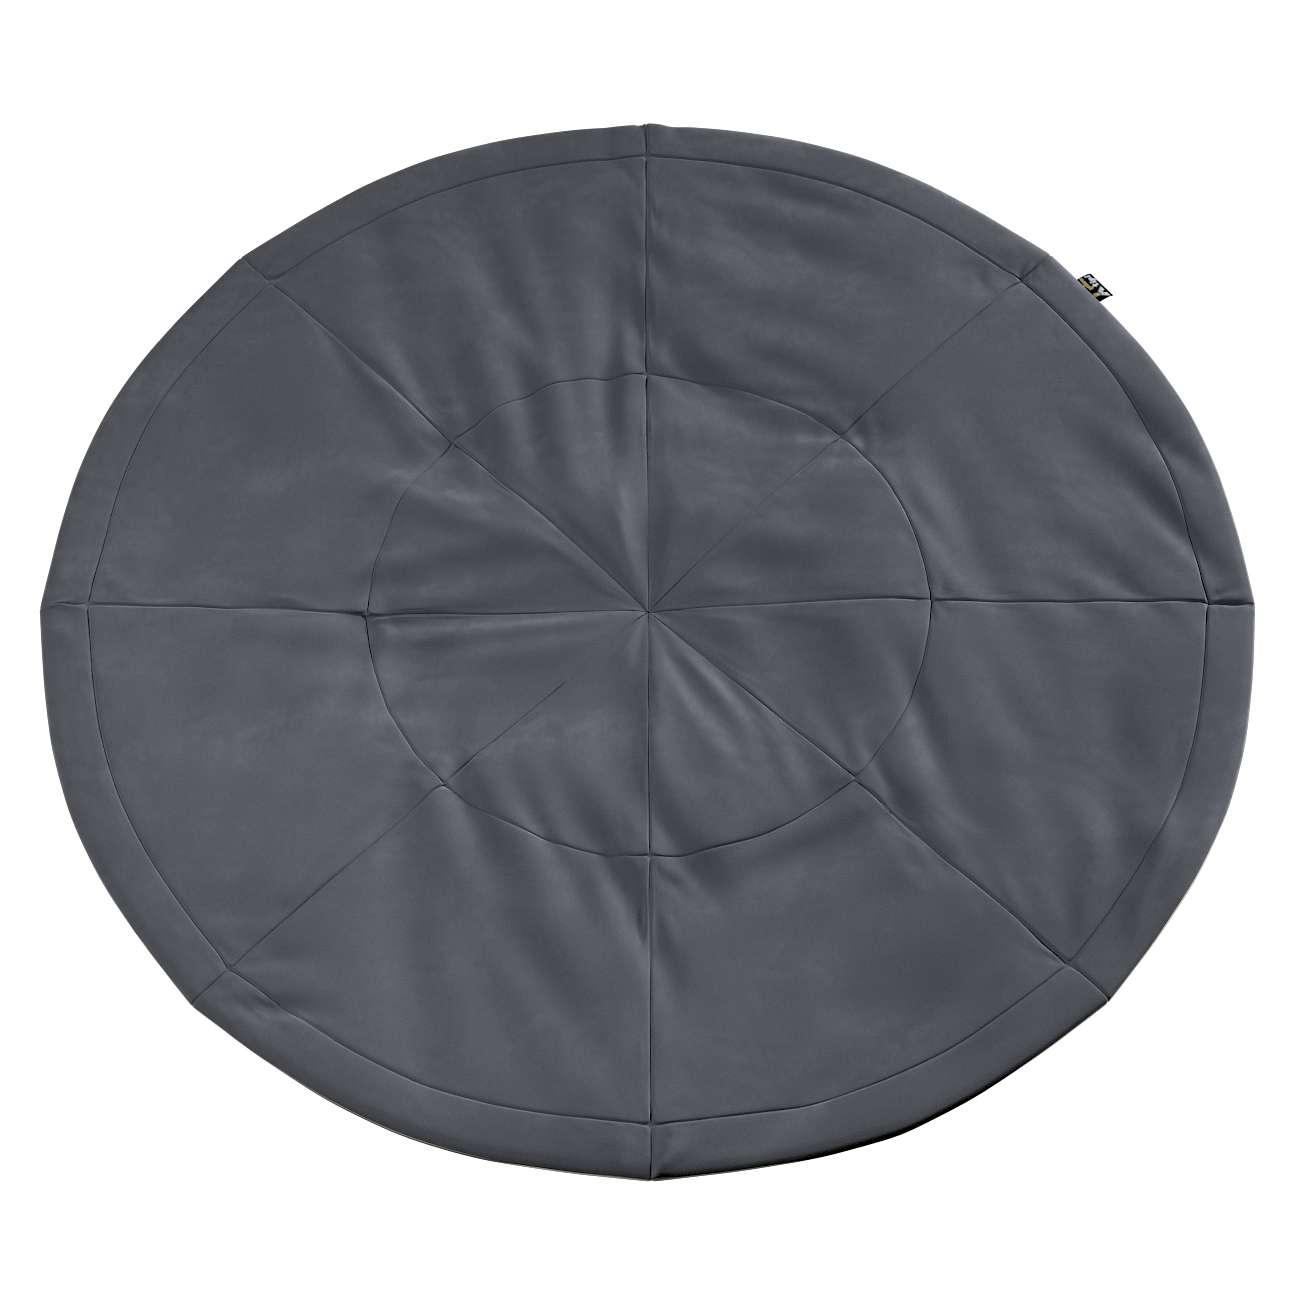 Round mat in collection Posh Velvet, fabric: 704-12